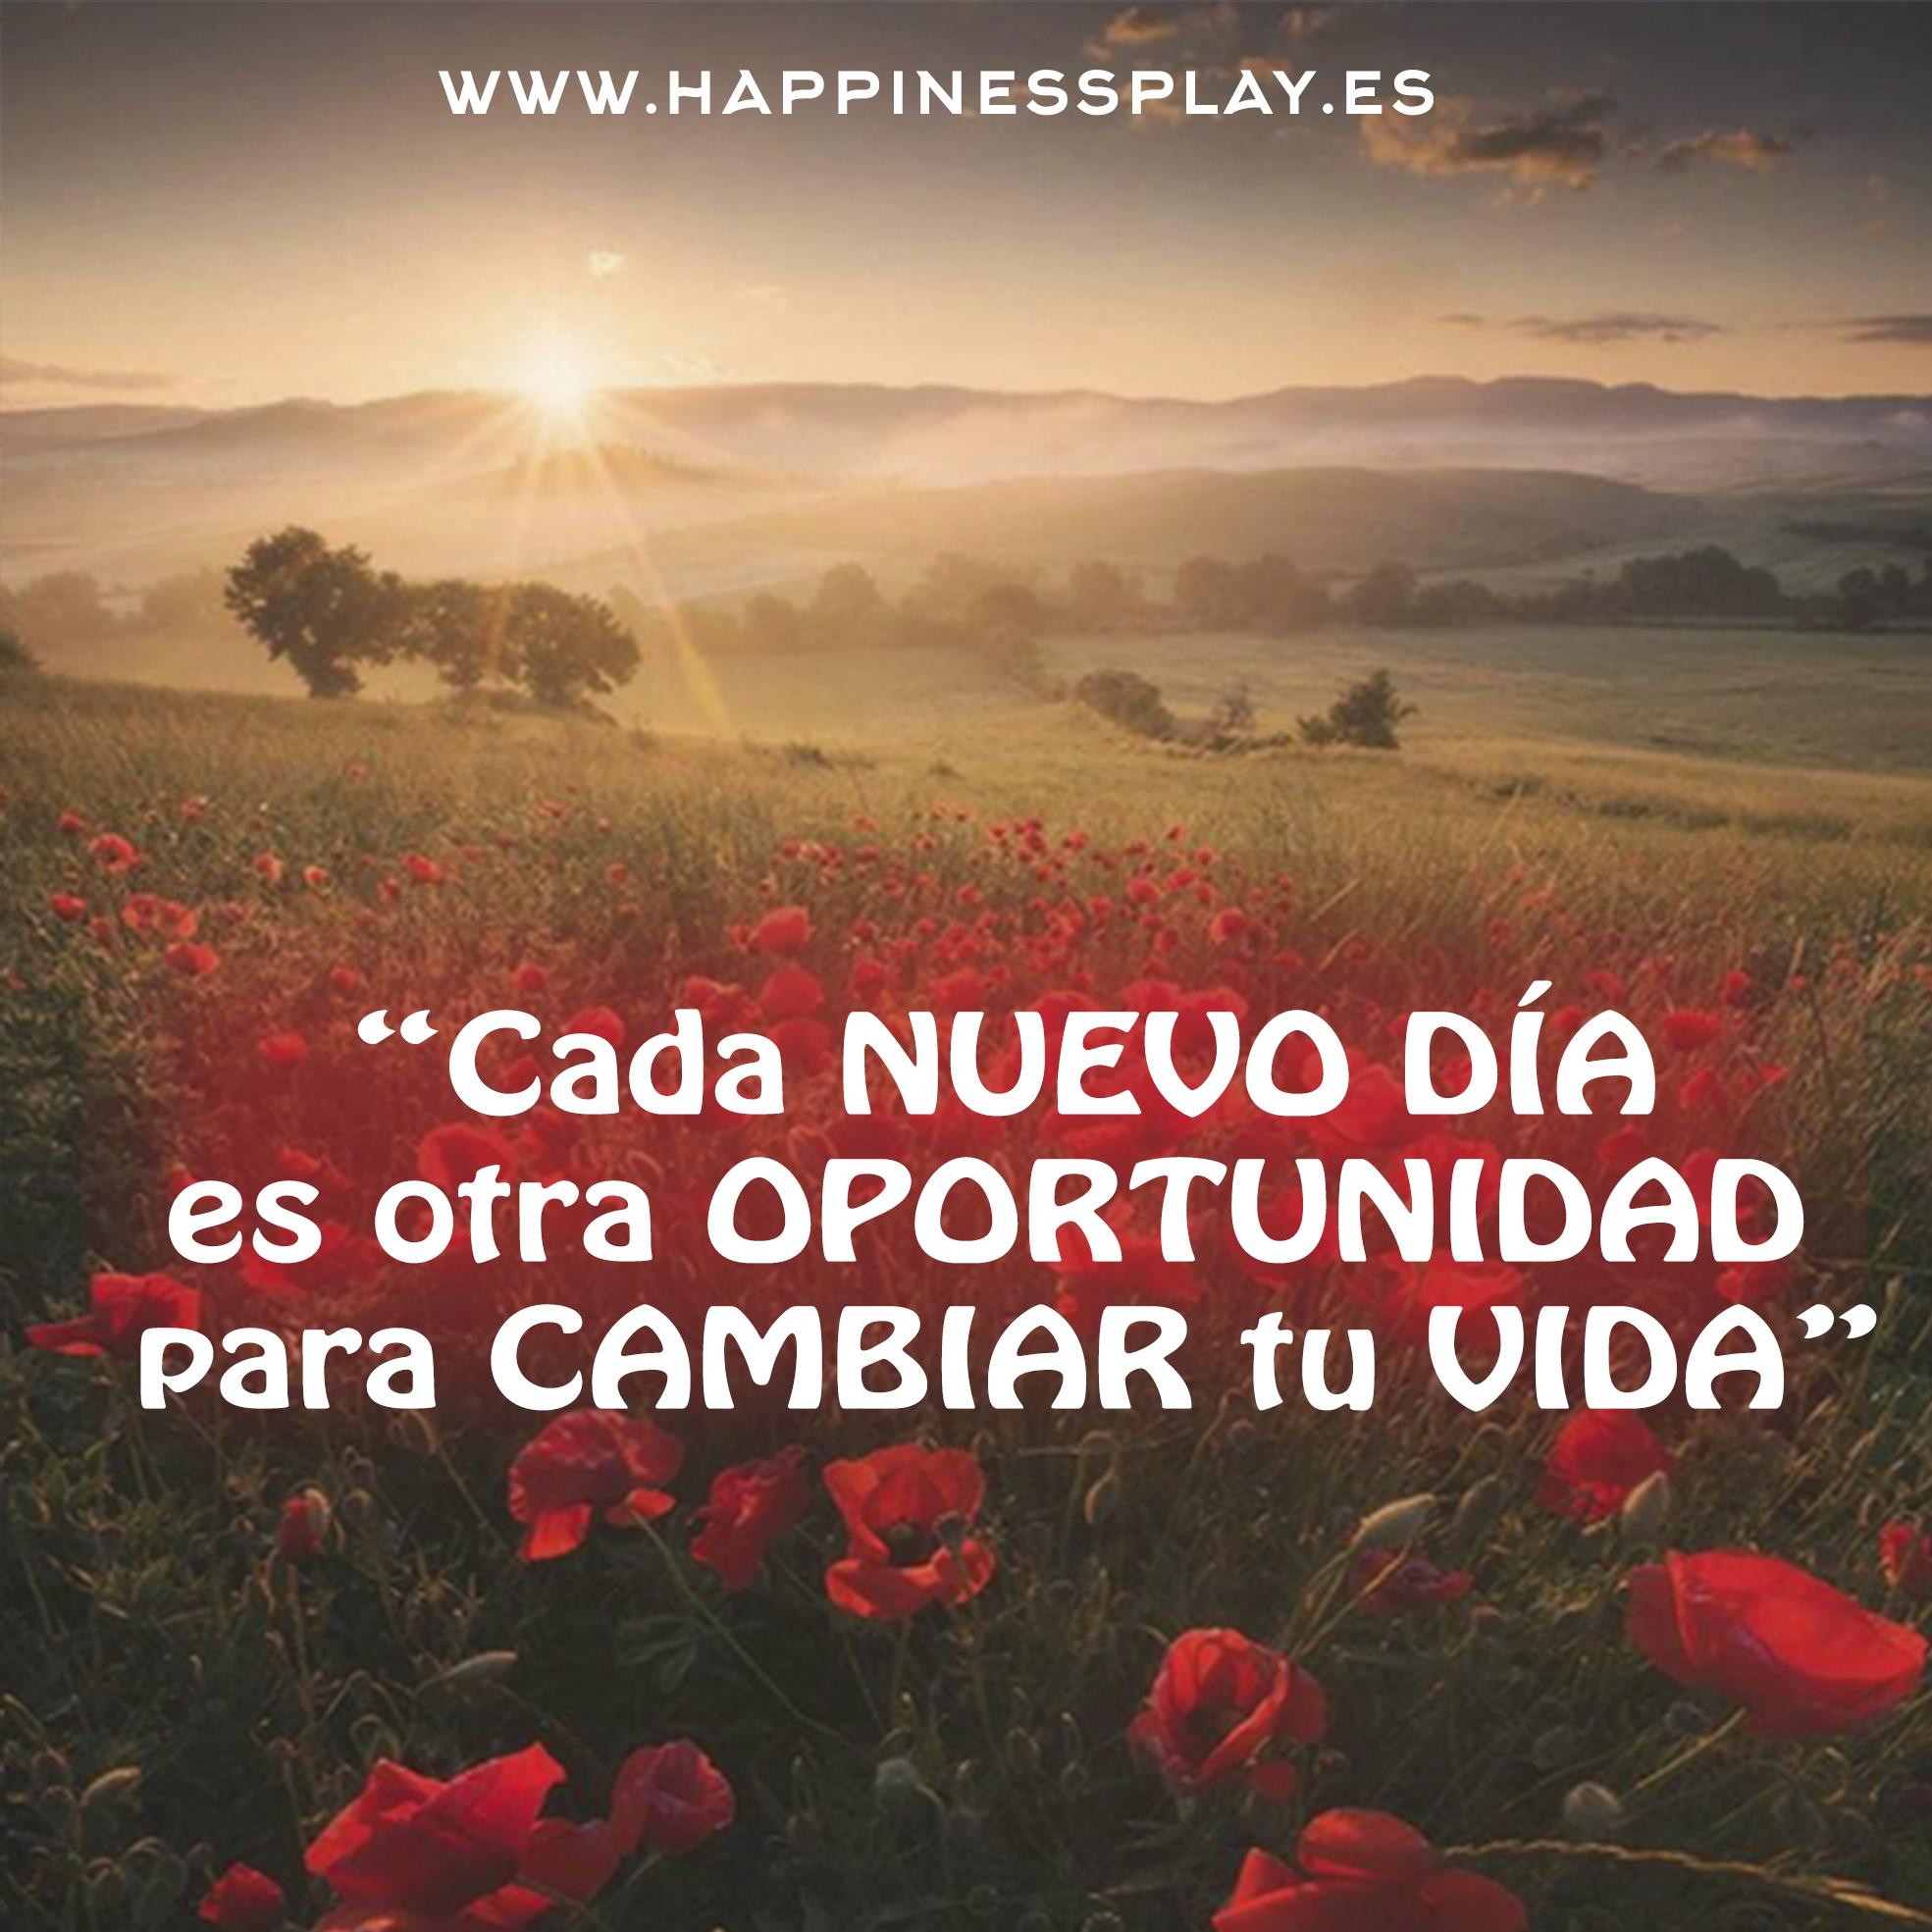 frases motivacionales happiness play blog 1969 x 1969 · jpeg